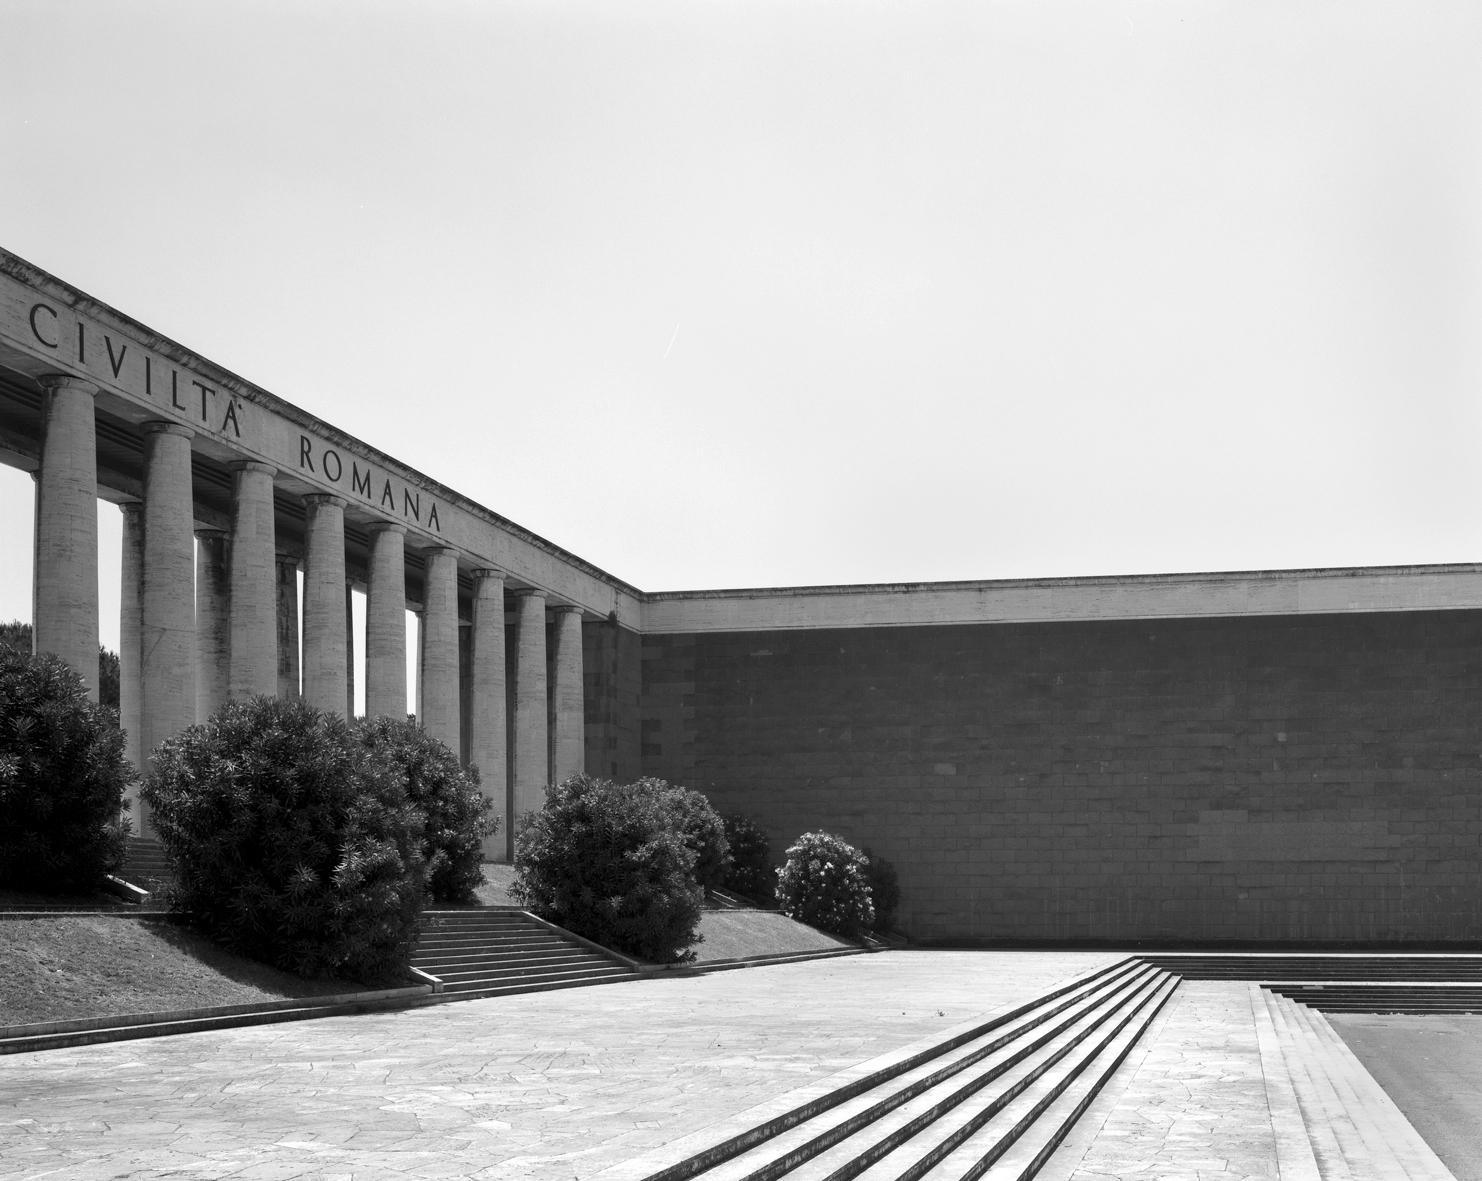 Hans-Christian Schink, EUR, Piazza Giovanni Agnelli #2 / Courtesy Galerie Rothamel, Galerie Kicken